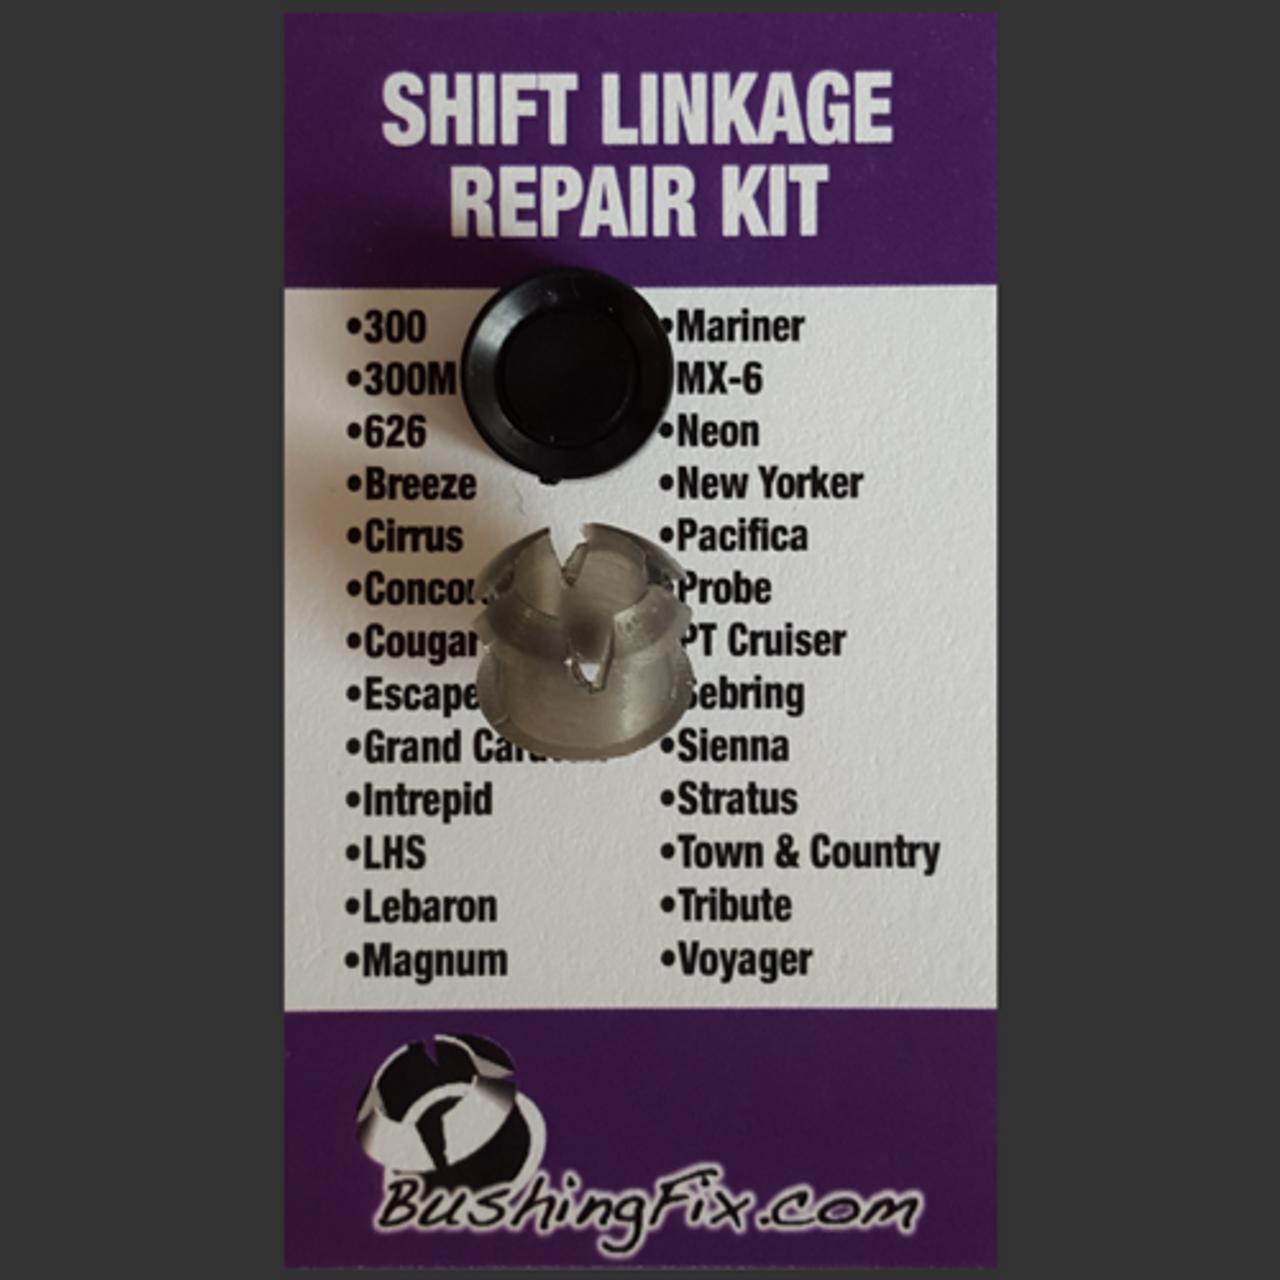 Fydun Gear Linkage Selector Bush 701711166 Gear Linkage Selector Kit de reparaci/ón Bujes para VW T4 Embrague